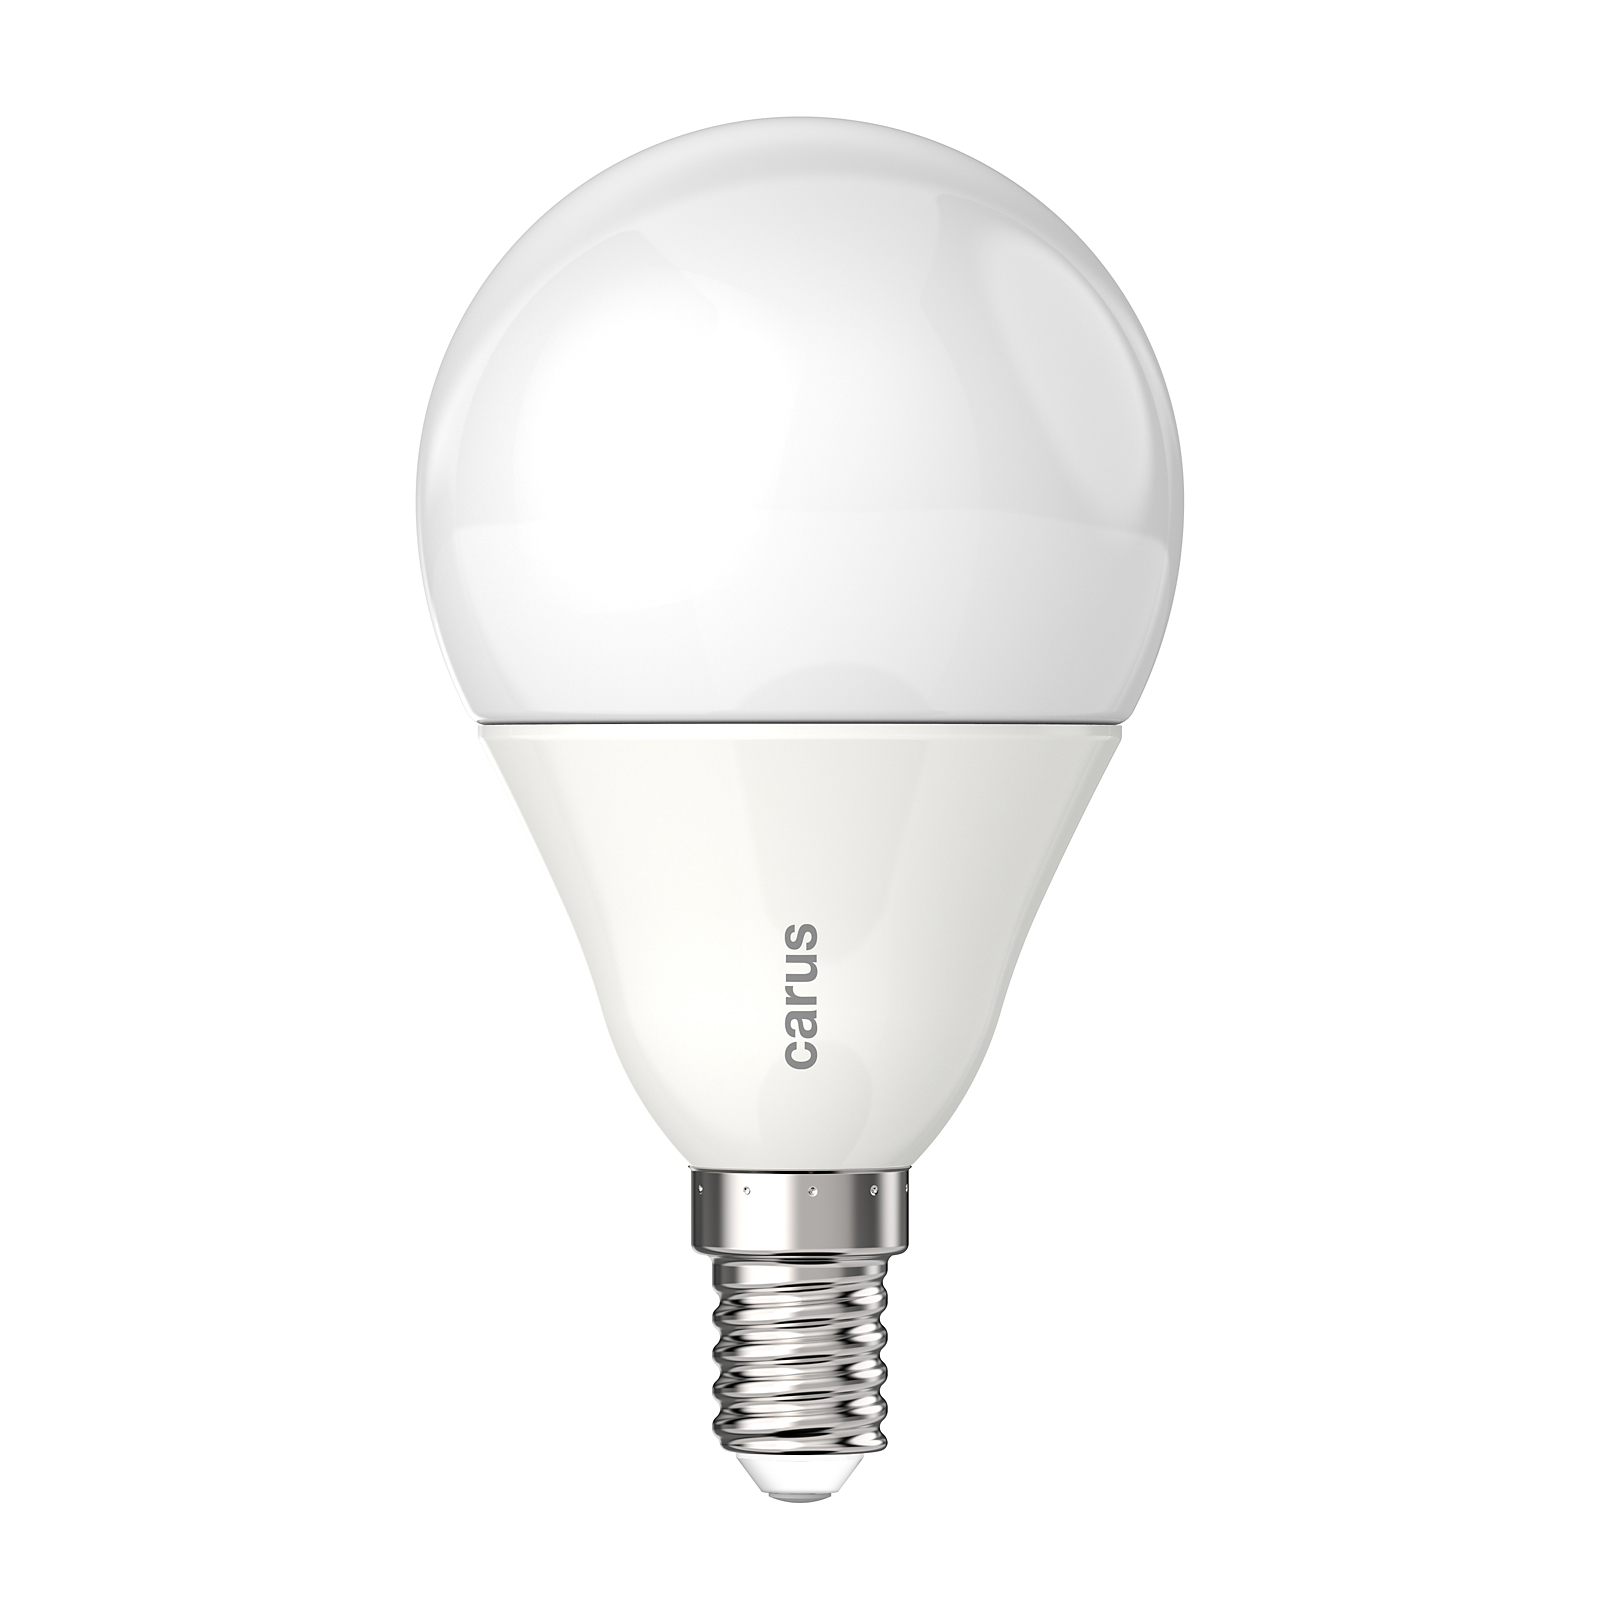 11009-CARUS-LED-Lampe-E14-63W-ersetzt-32-Watt-400-Lumen-warmweiss-dimmbar-90-Ra-1 Wunderbar Sind Led Lampen Dimmbar Dekorationen